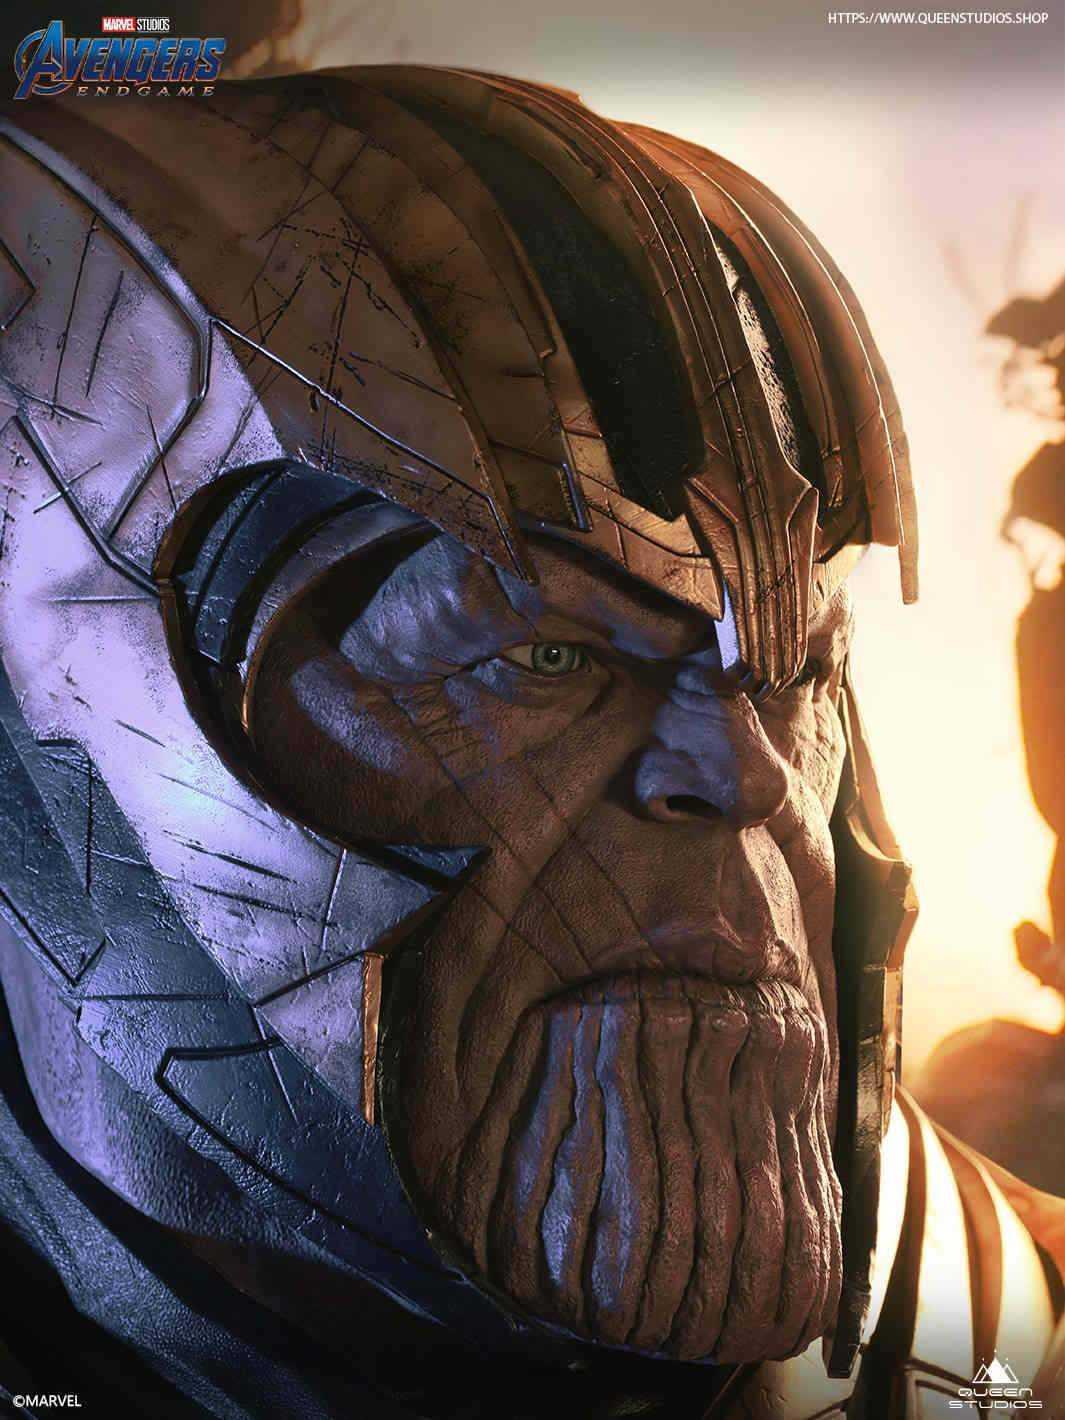 Avengers: Endgame, arriva la statua di Thanos in scala 1:1